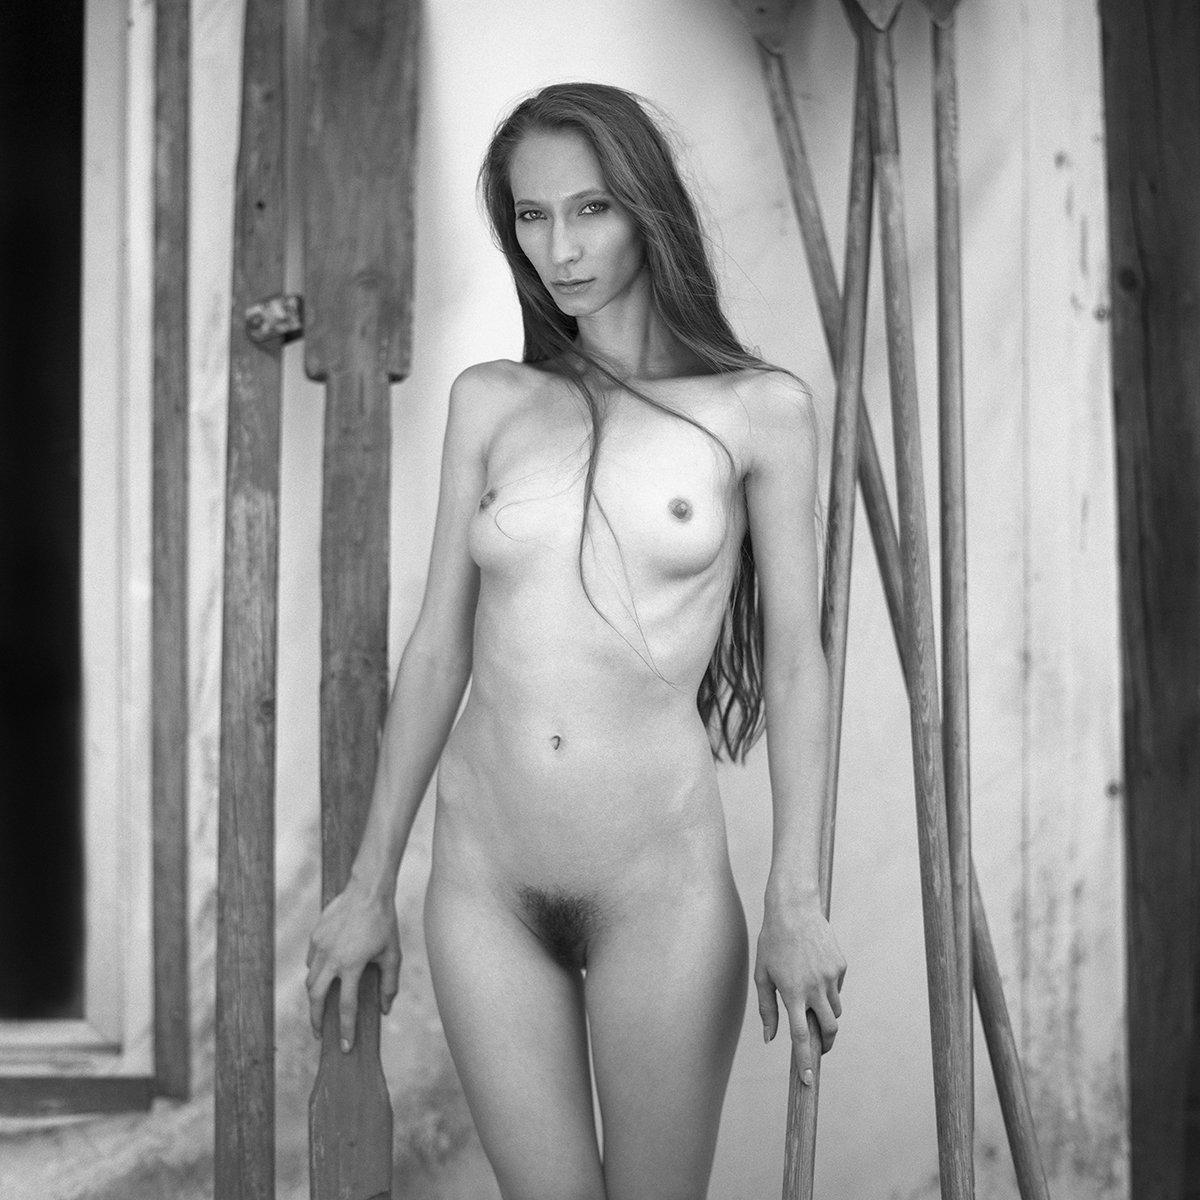 akt, nude, analog, women, hasselblad, ninoveron, fineart, eyes, bw, 6x6,, NinoVeron